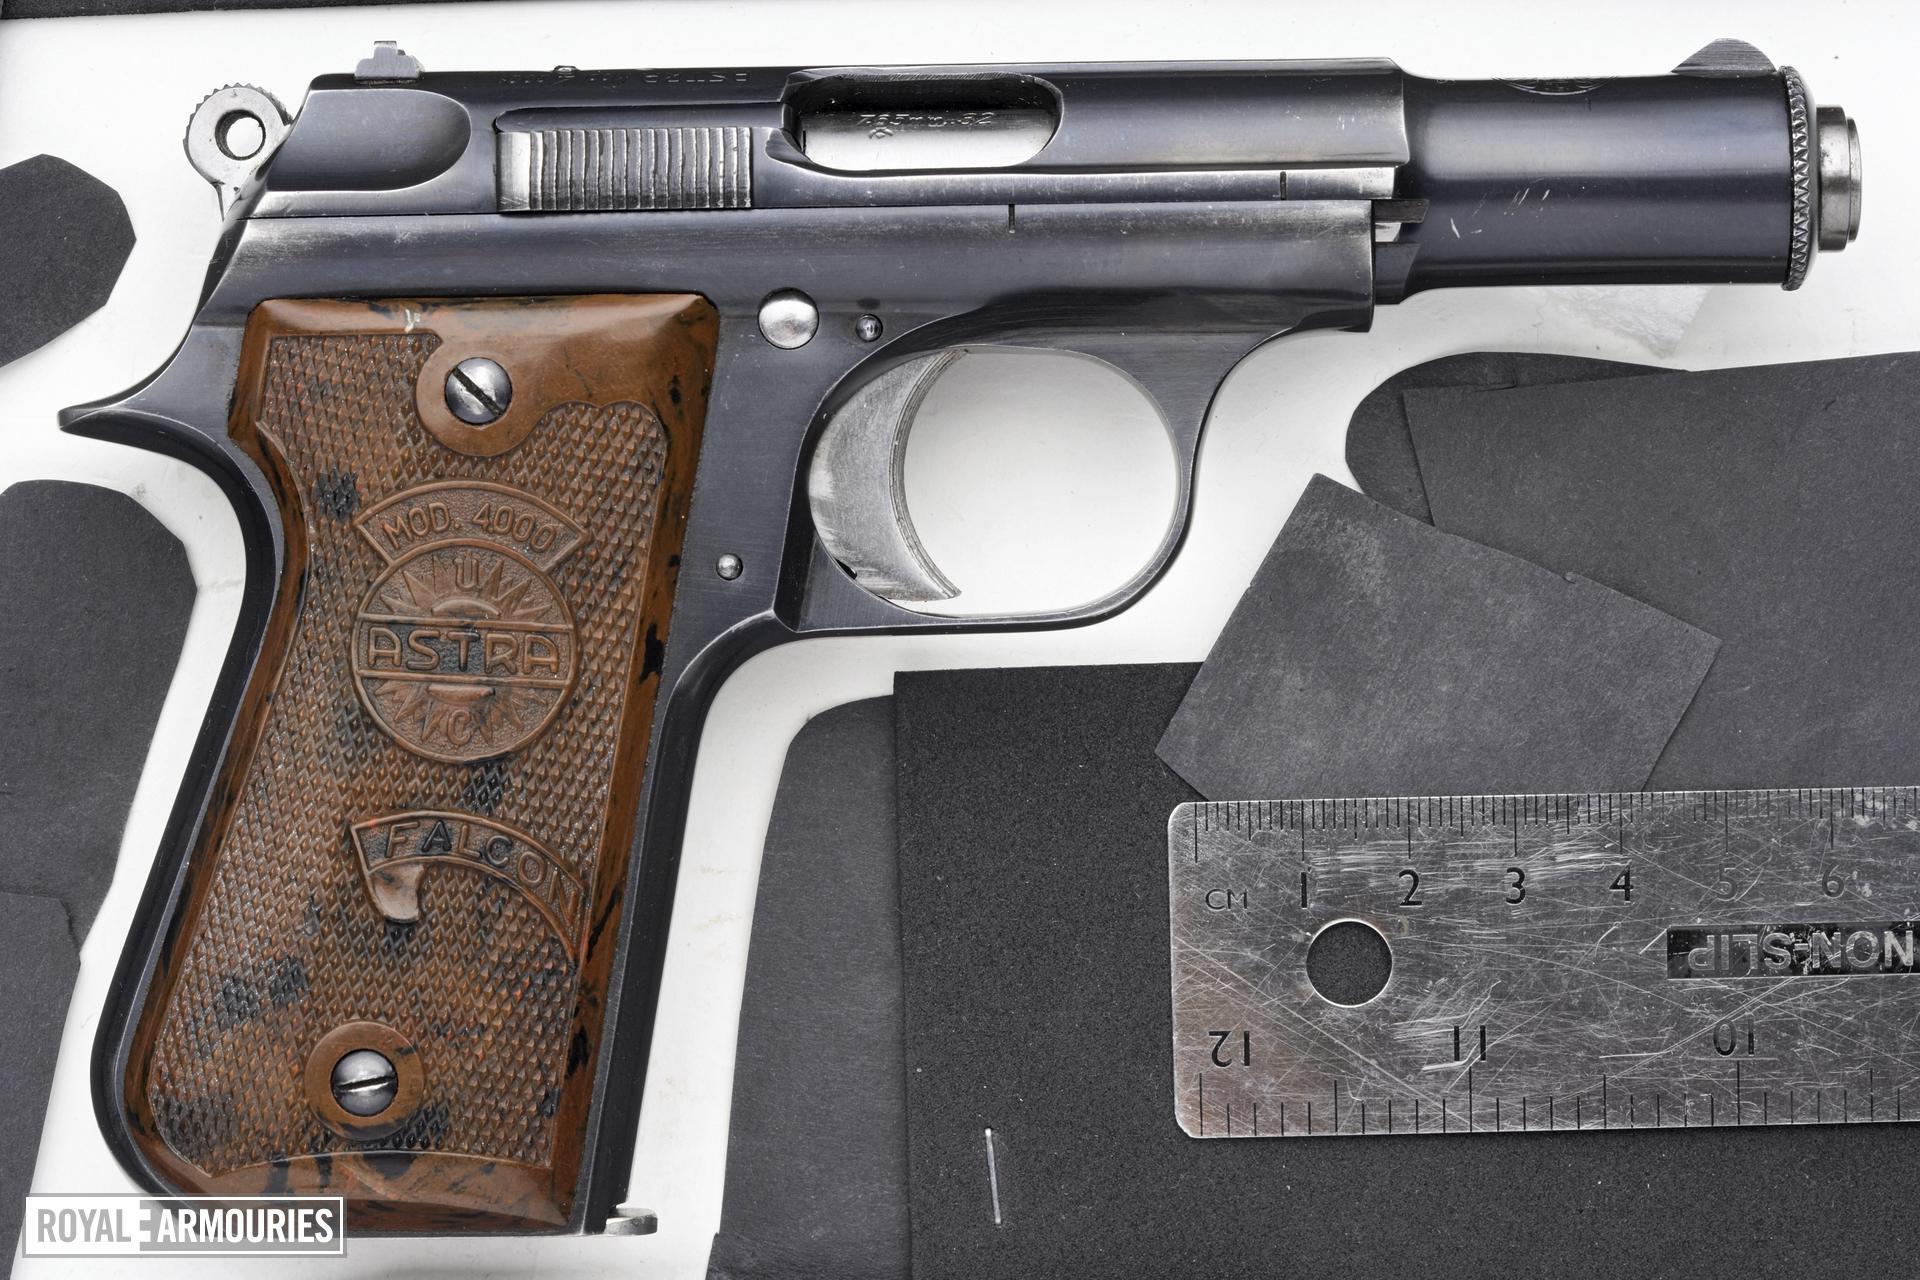 Centrefire self-loading pistol - Astra Model 4000